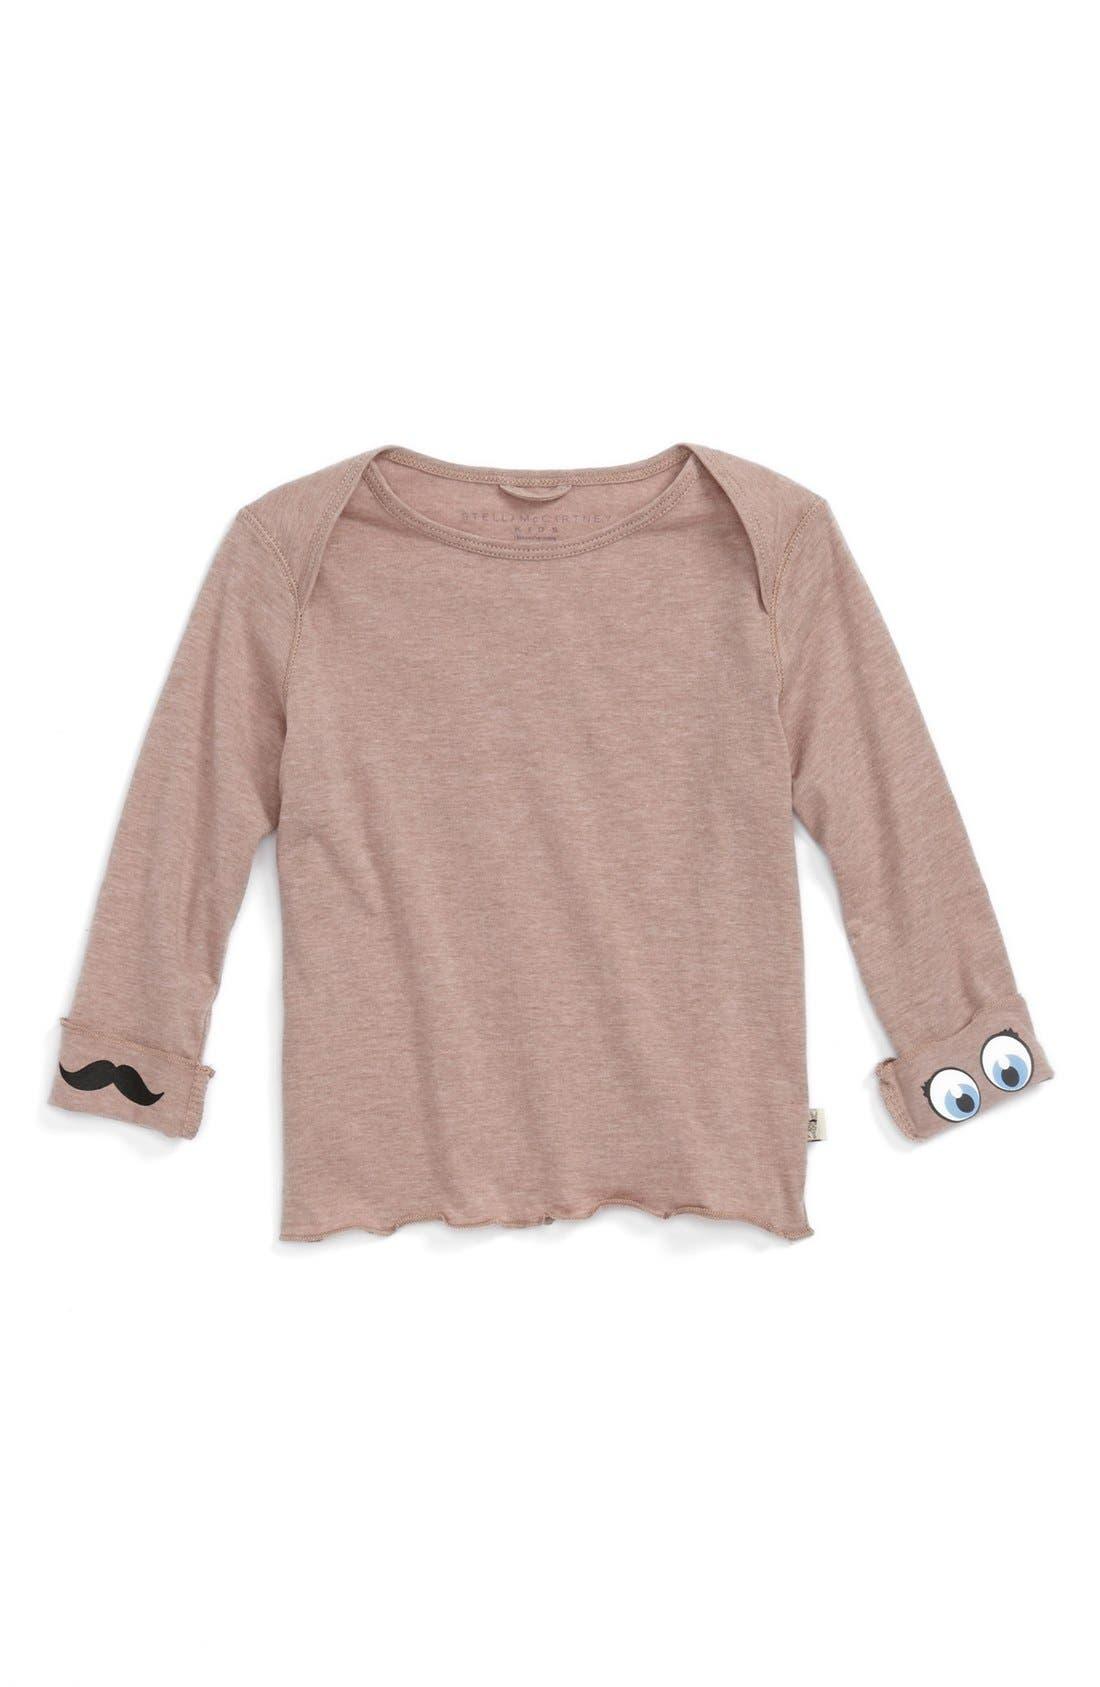 Main Image - Stella McCartney Kids 'Buster' T-Shirt (Baby Girls)